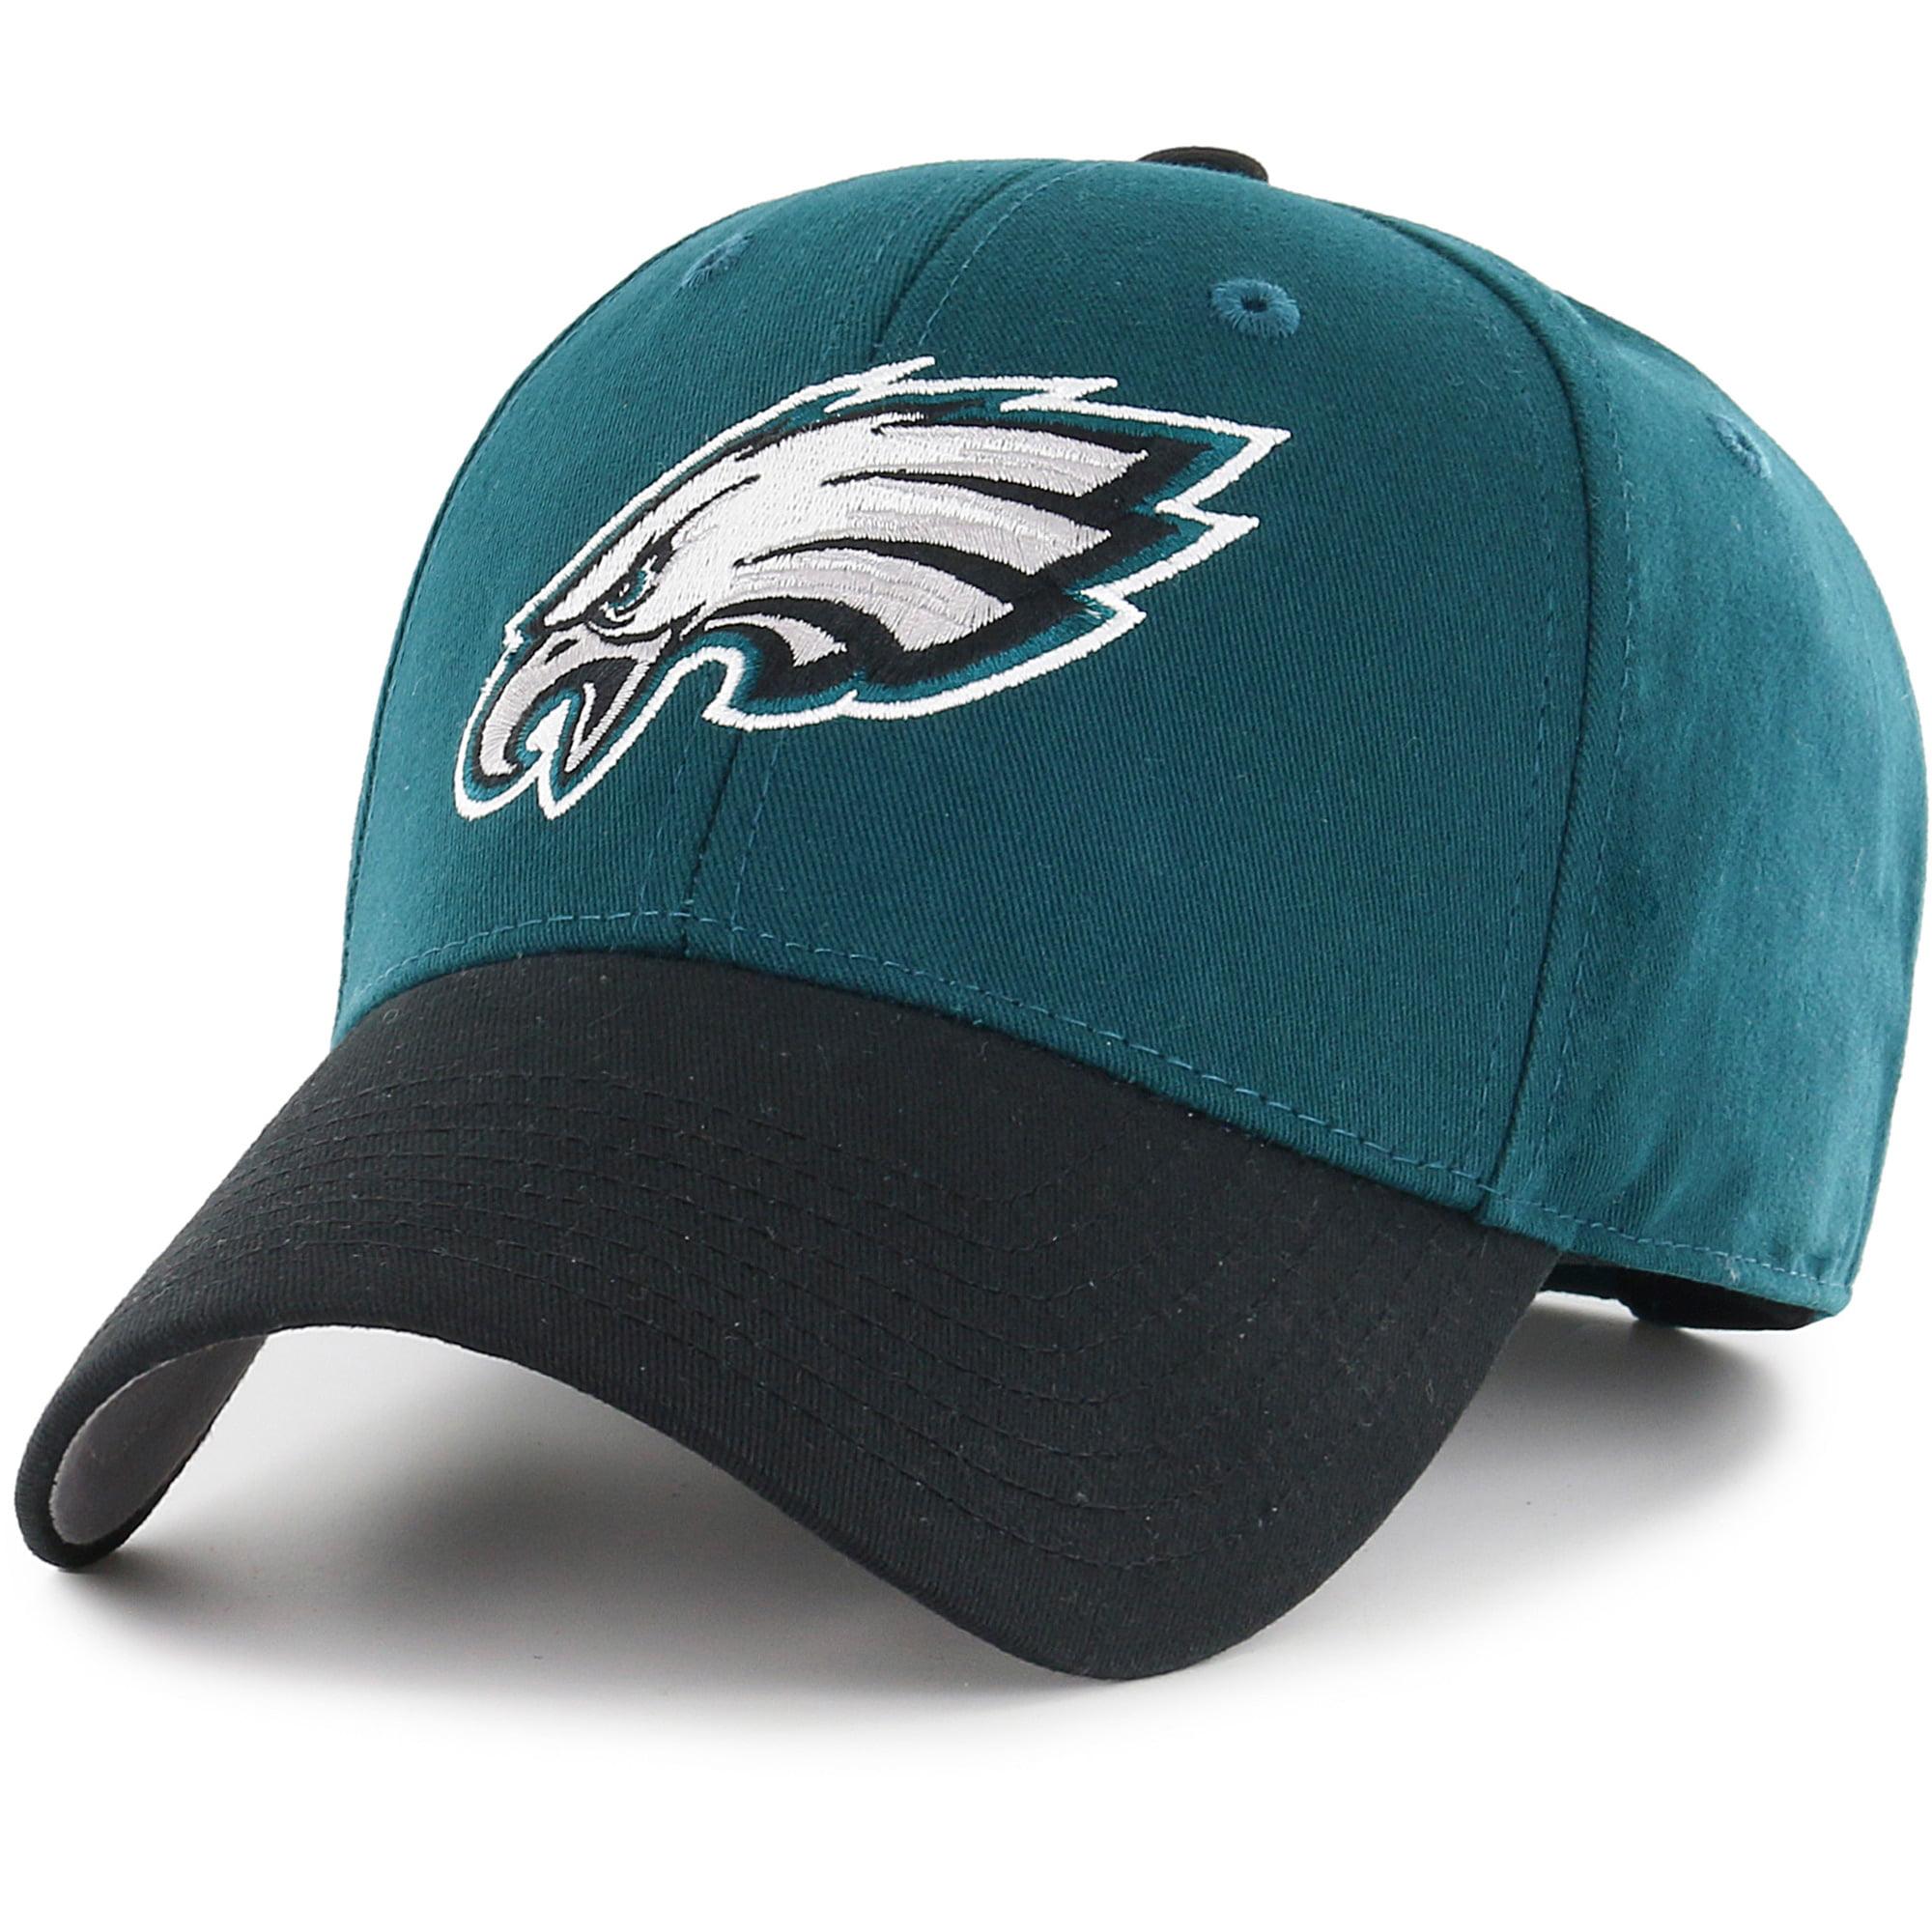 Youth Fan Favorite Green/Black Philadelphia Eagles Two-Tone Adjustable Hat - OSFA